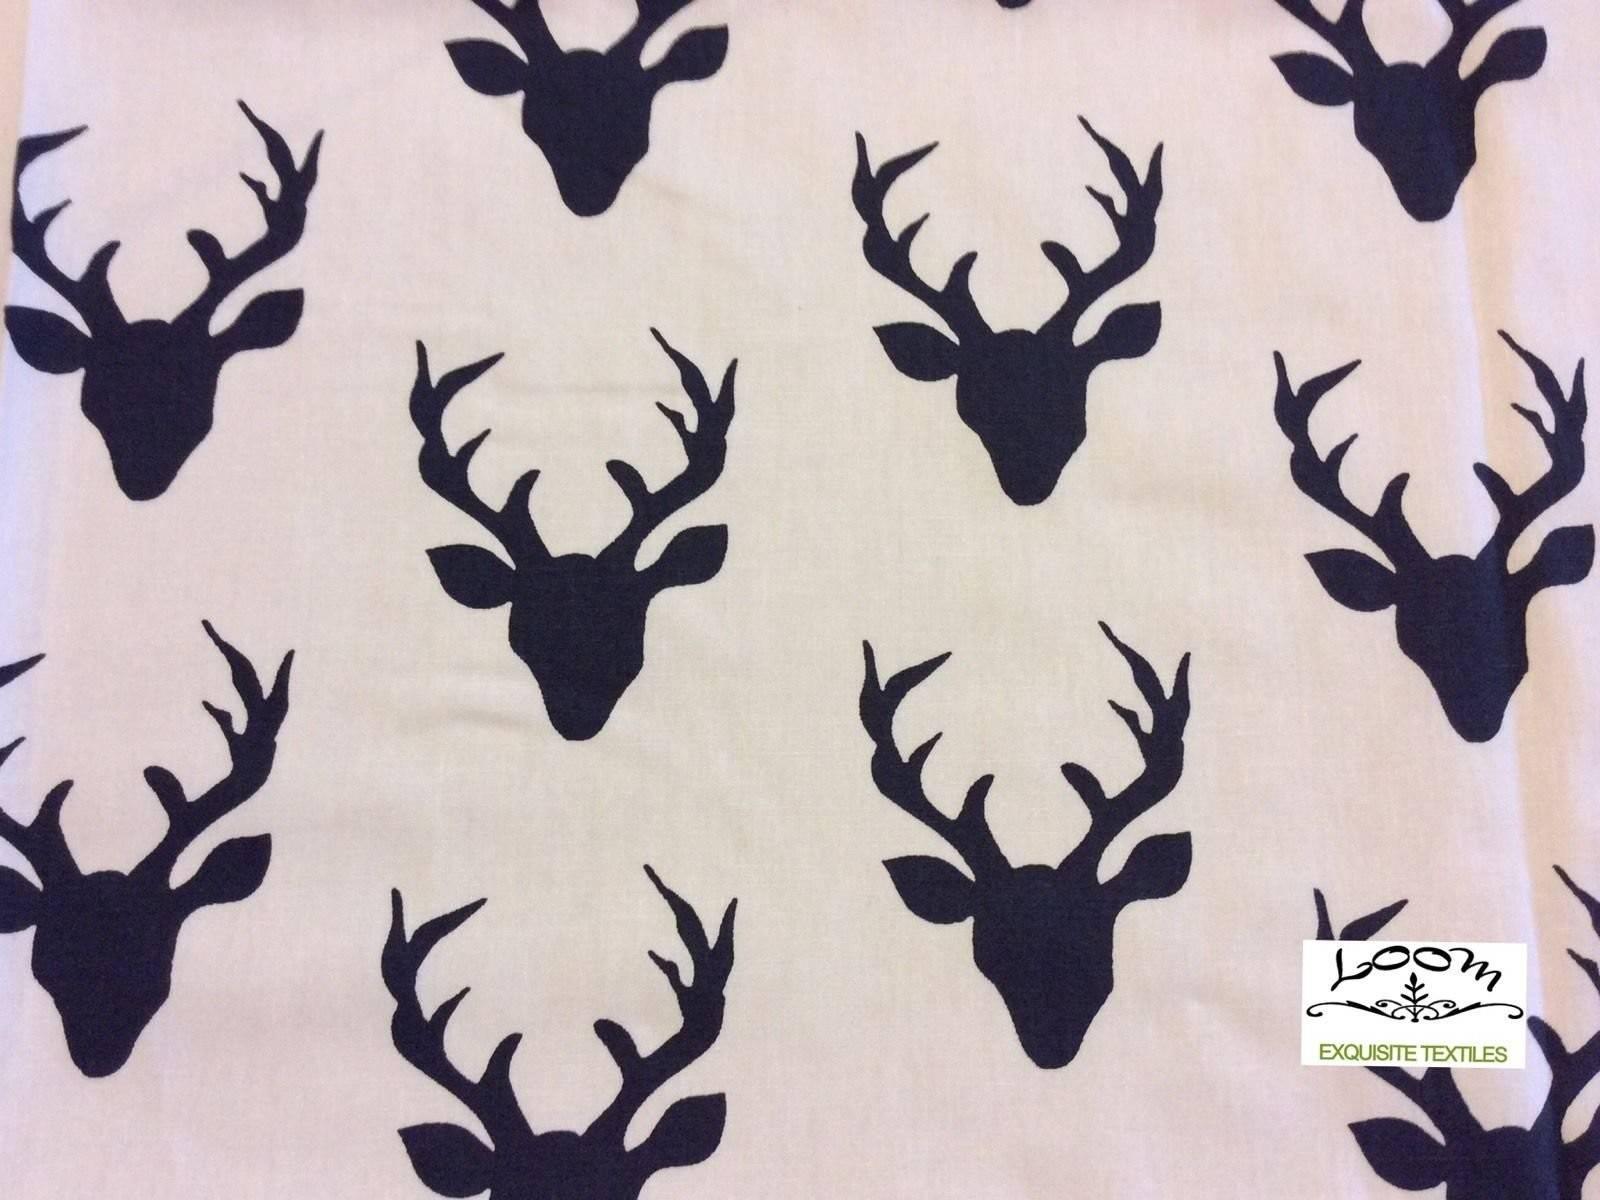 Deer Antler Silhouette Scandinavian Retro Cotton Quilting Fabric